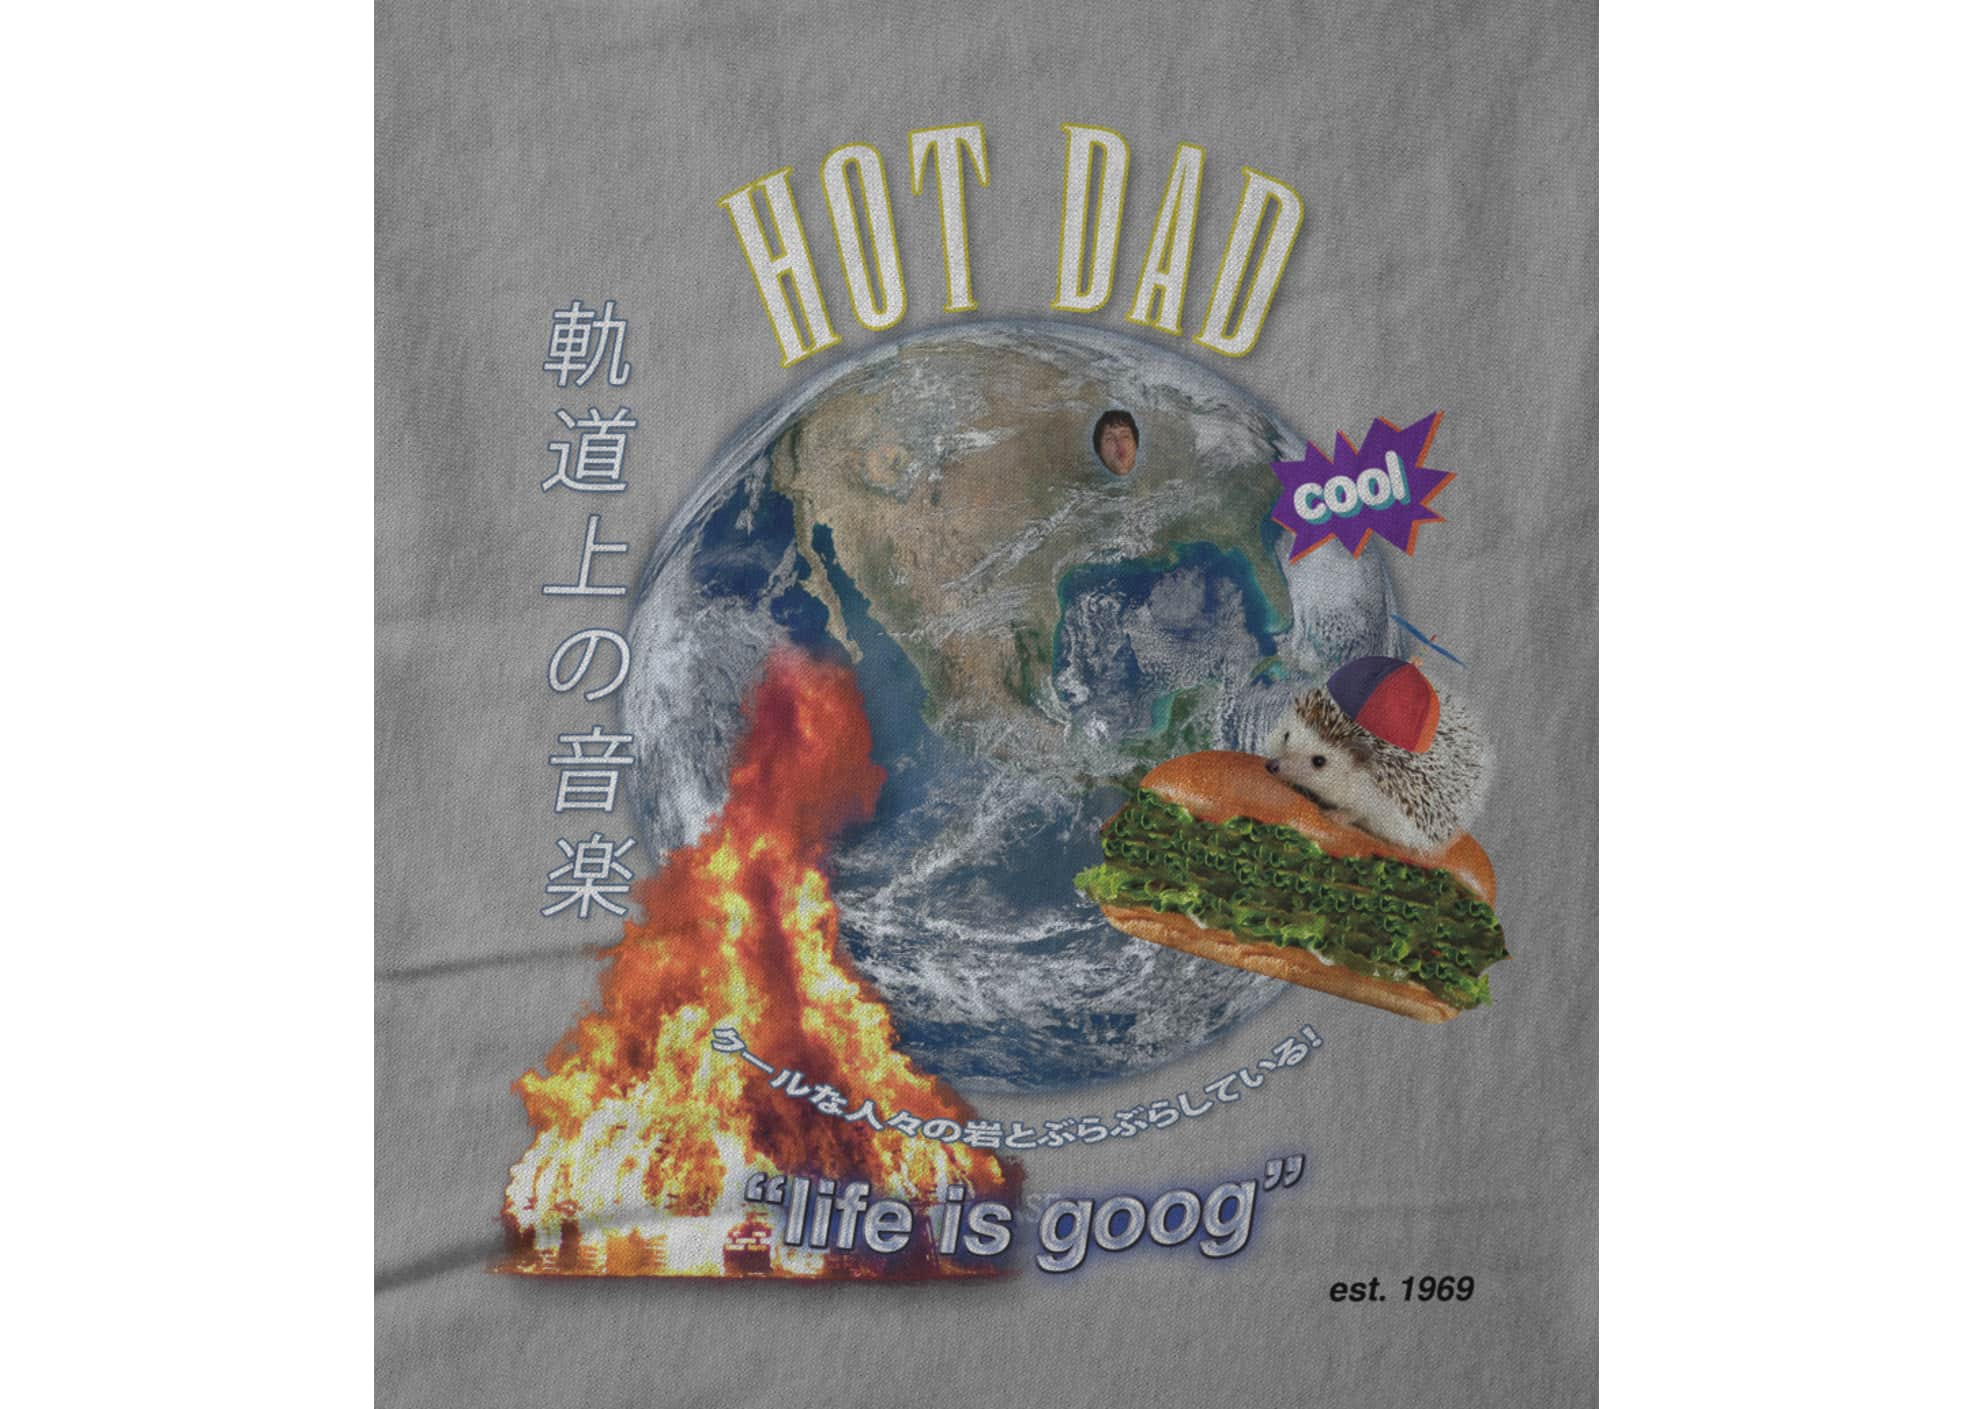 Hot dad peter s delight 1494003531